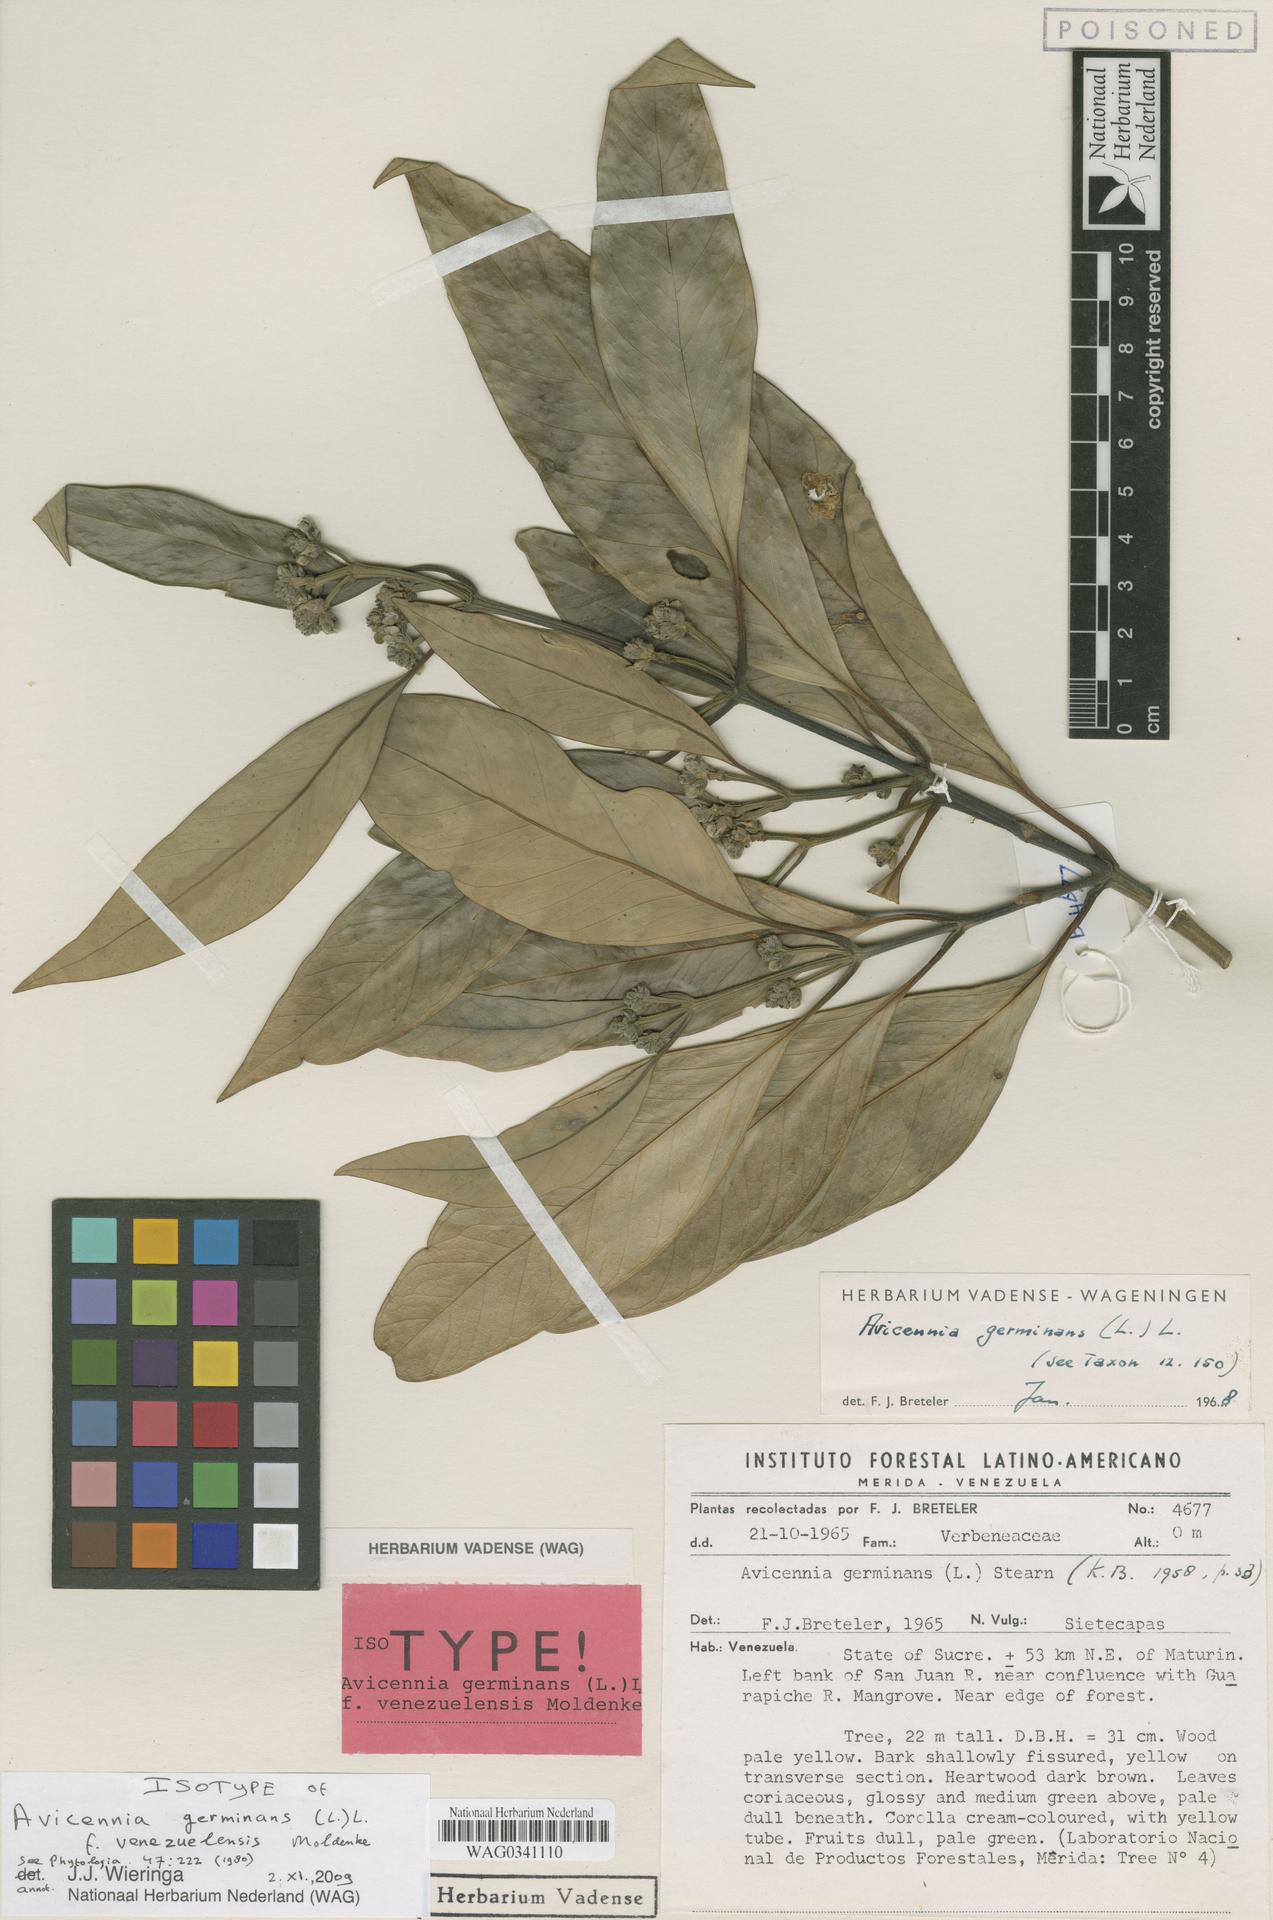 WAG0341110 | Avicennia germinans (L.) L.